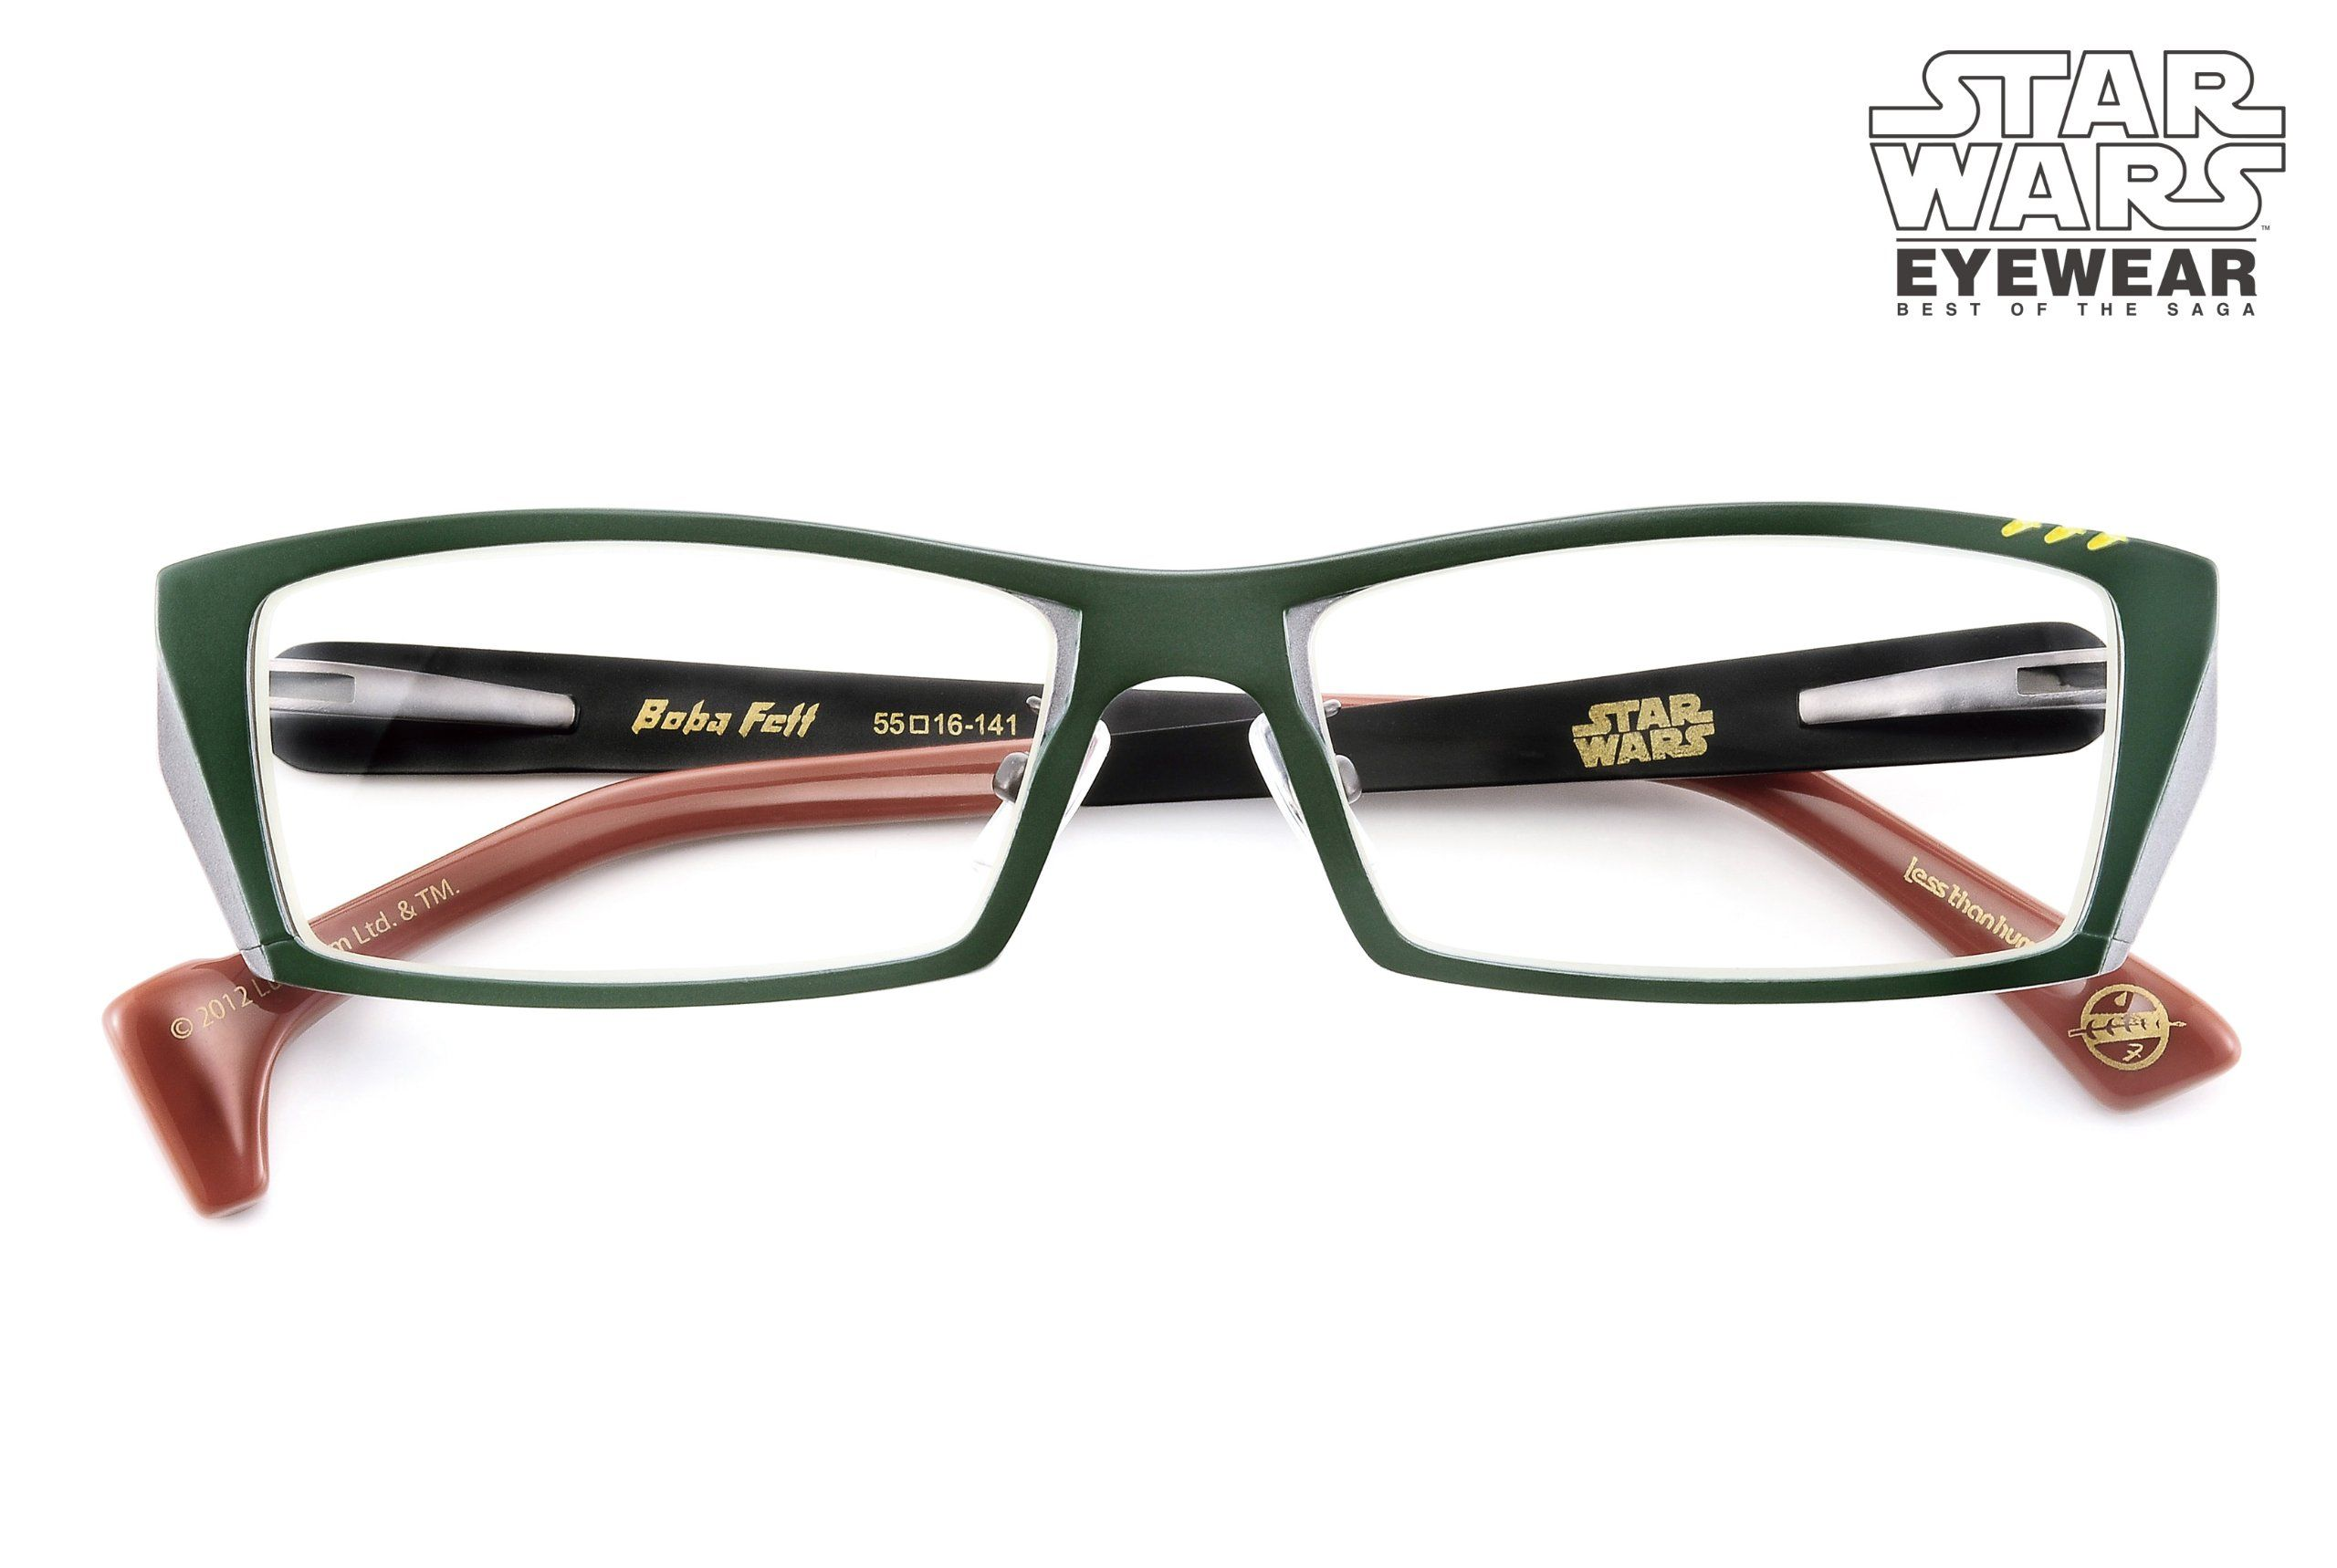 Amazon.co.jp: Boba Fett STAR WARS EYEWEAR (Star Wars eyewear Boba ...